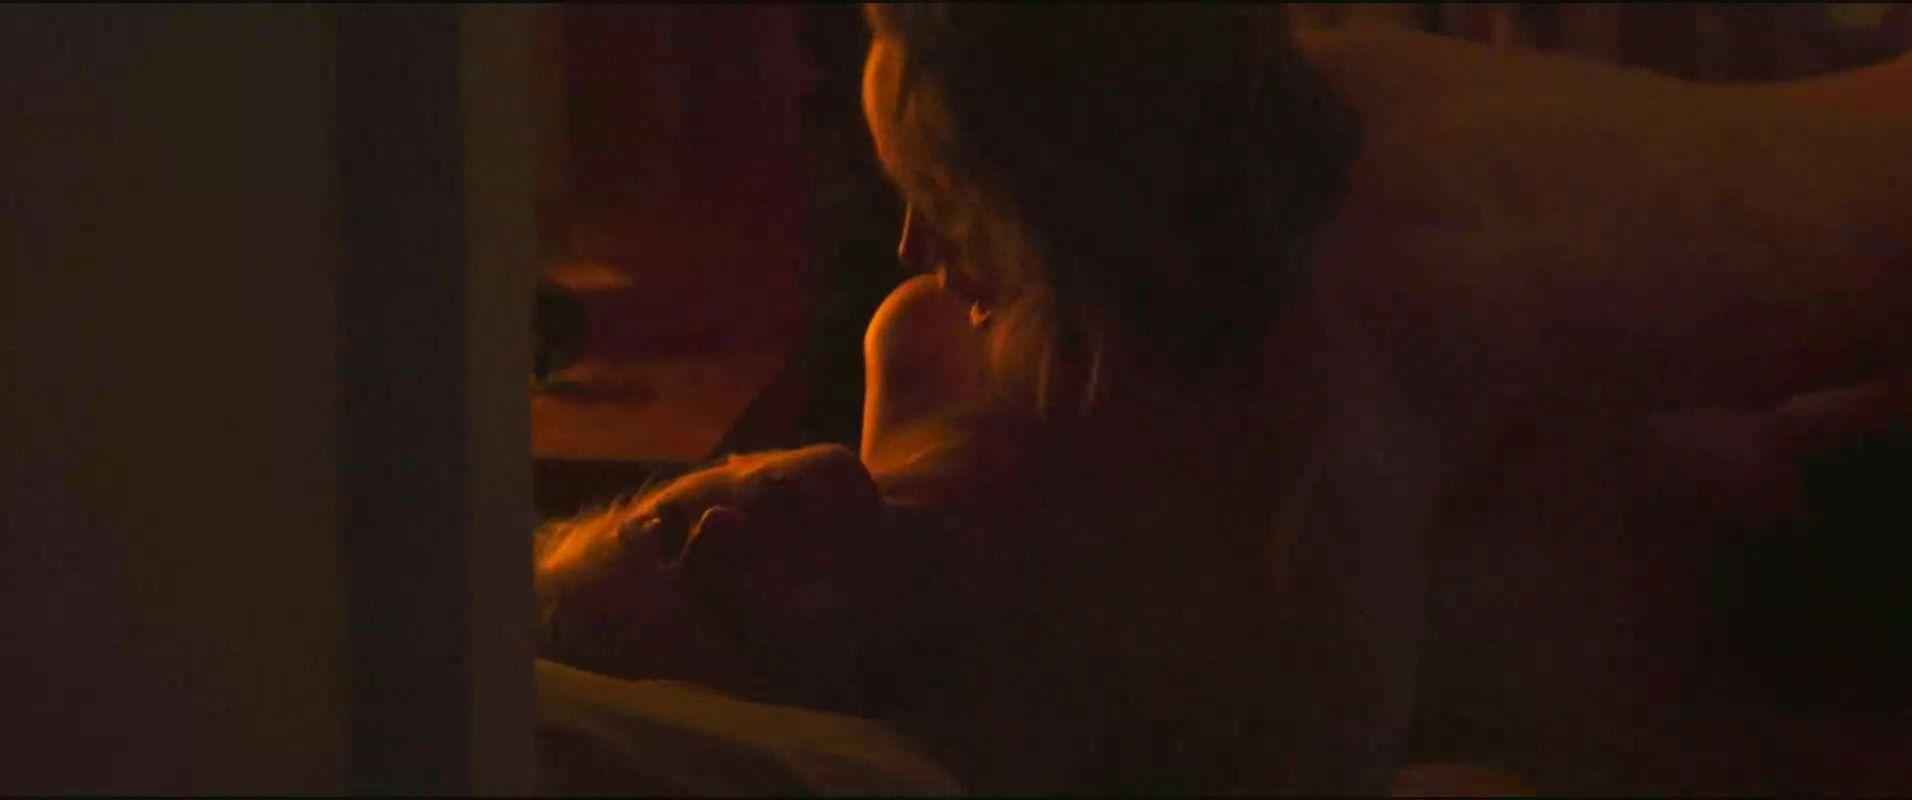 0418173952100_37_Kate-Mara-Ellen-Page-Nude-TheFappeningBlog.com-17.jpg